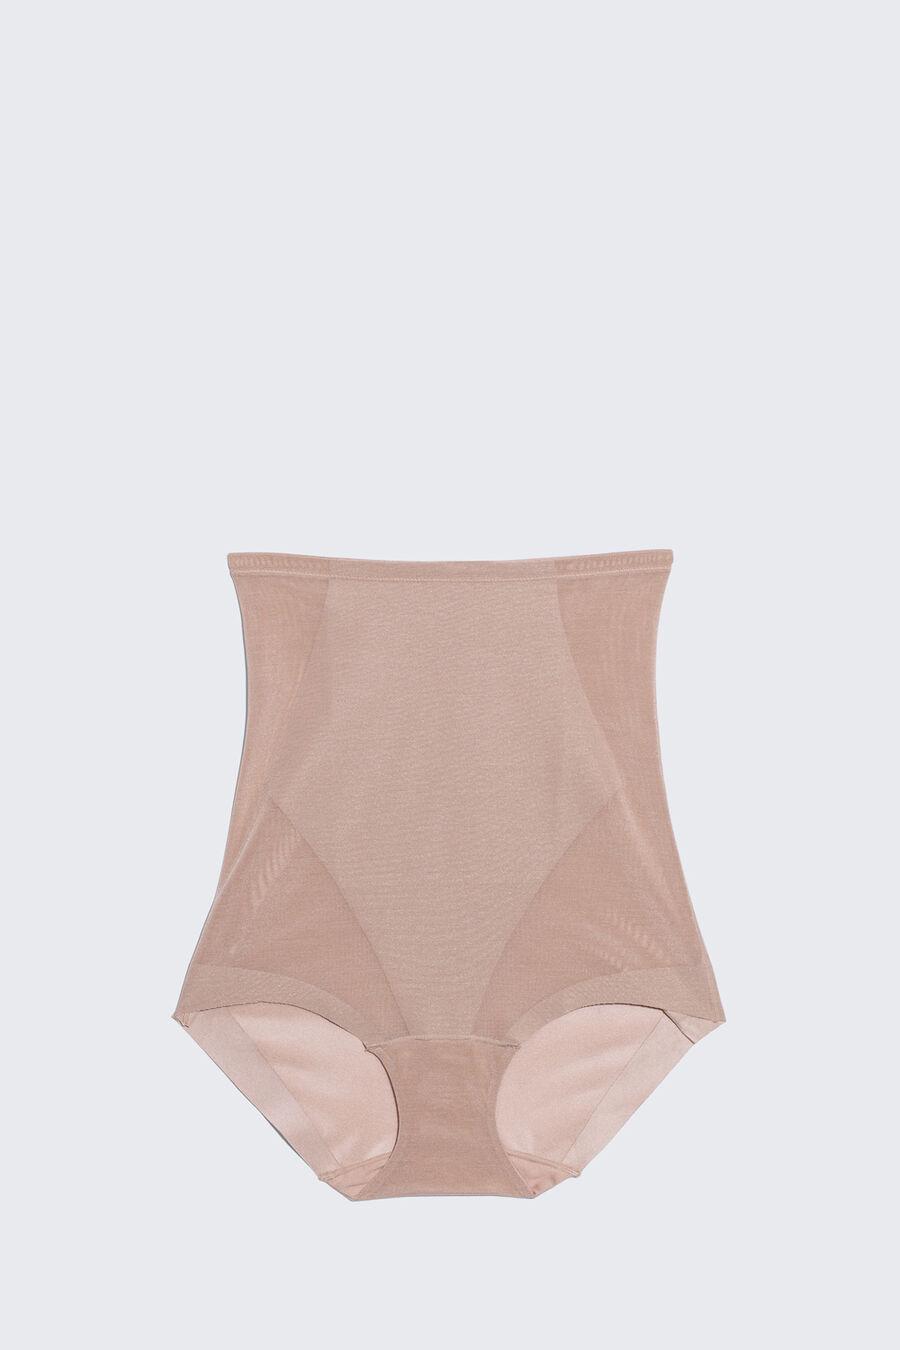 Shapewear high-waist tulle panty